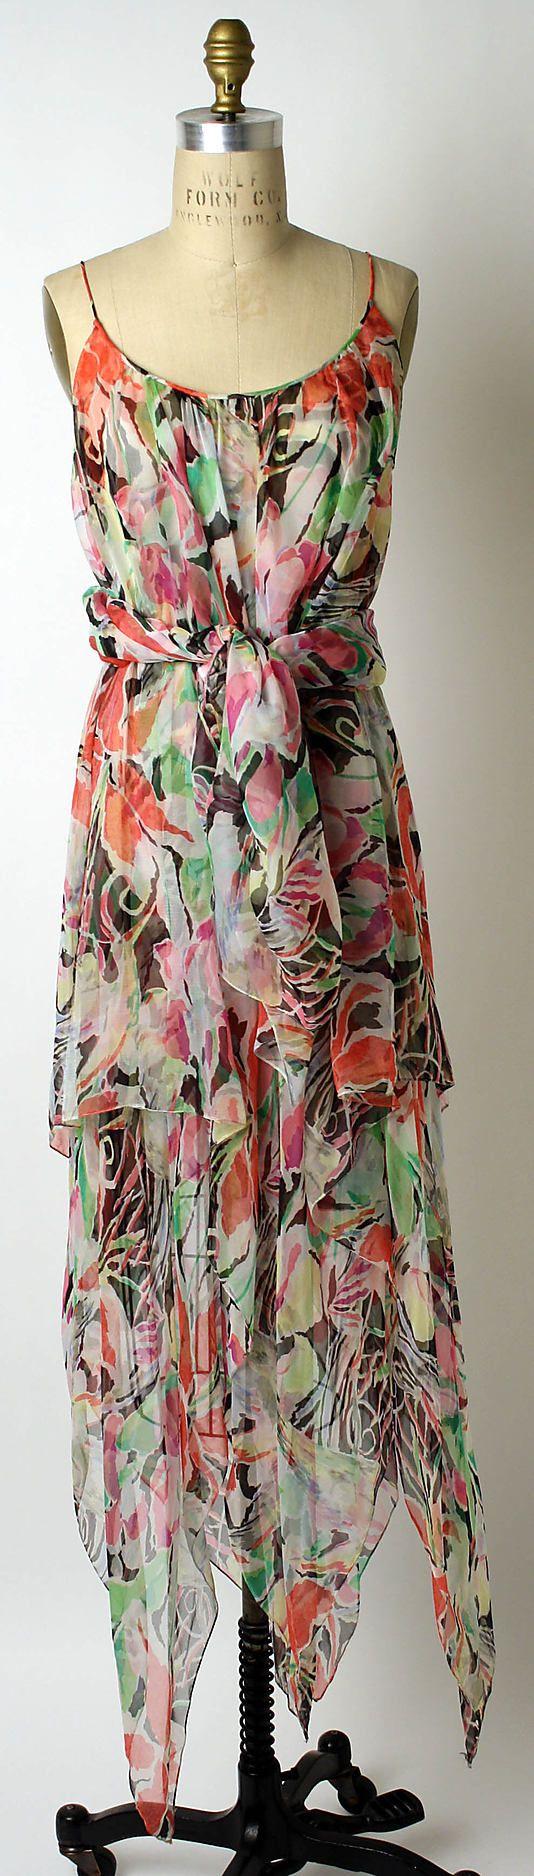 Print silk chiffon evening dress, by Oscar de la Renta, American, early 1970s.